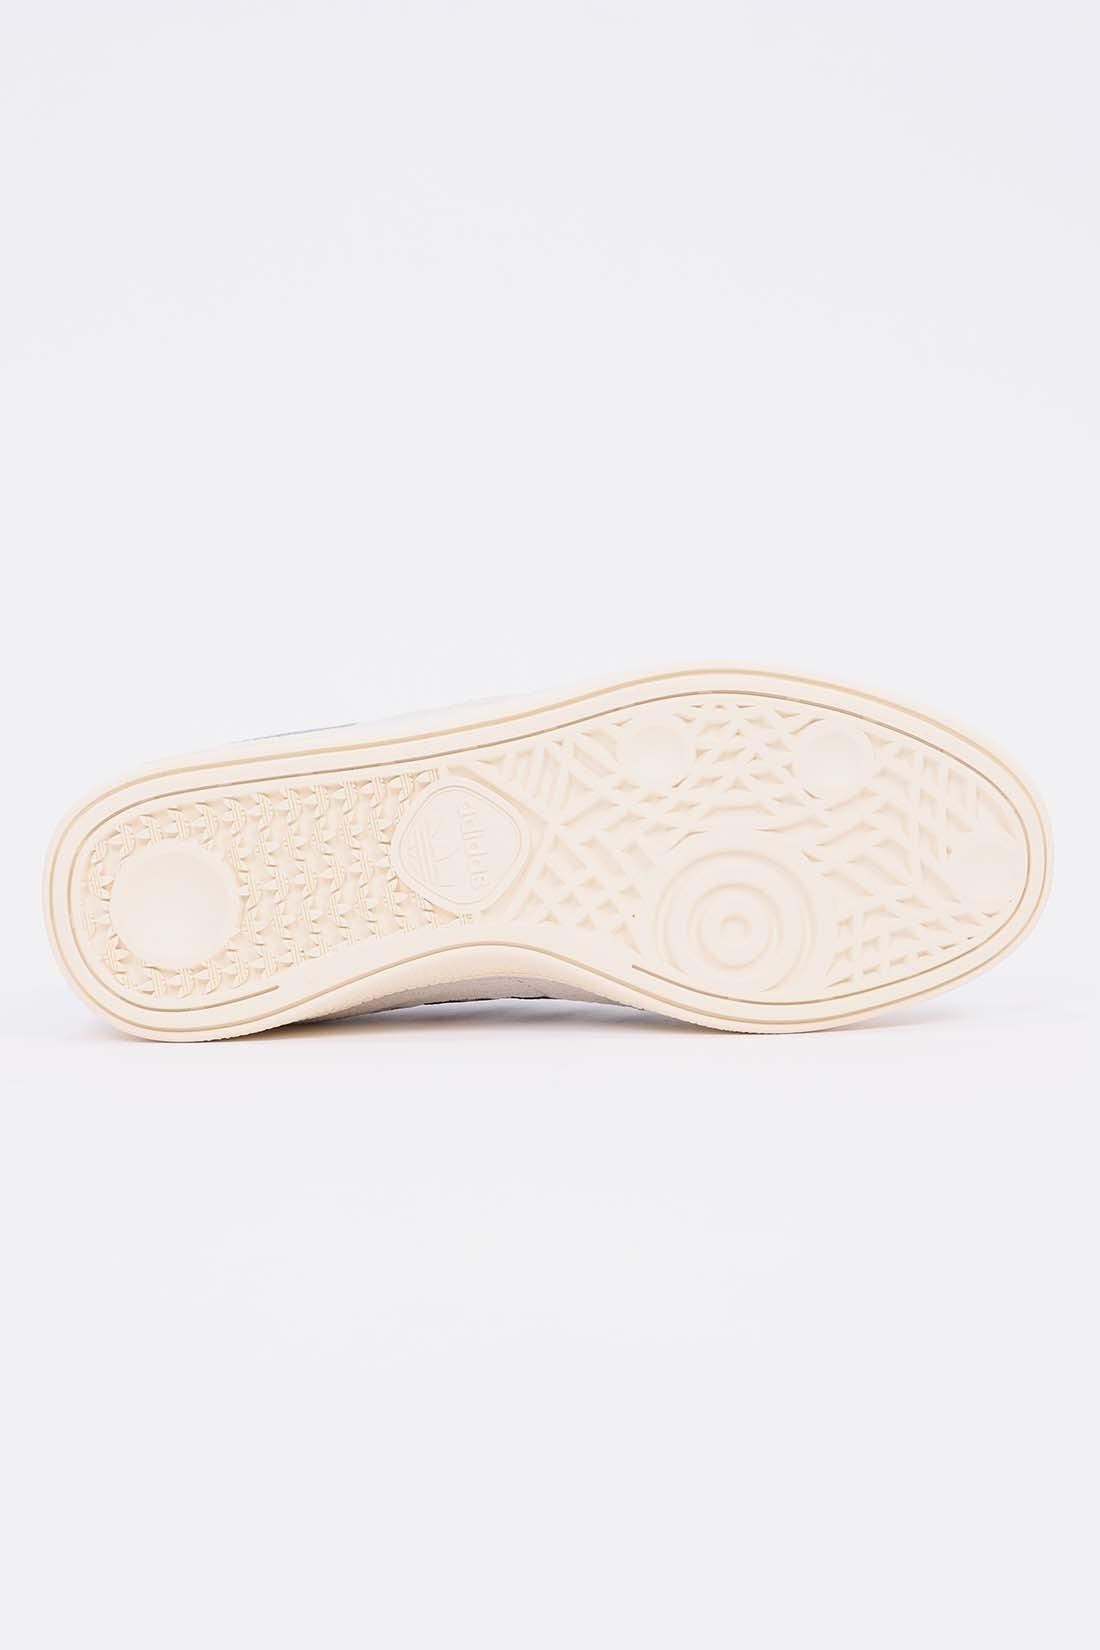 ADIDAS / Handball top Raw white